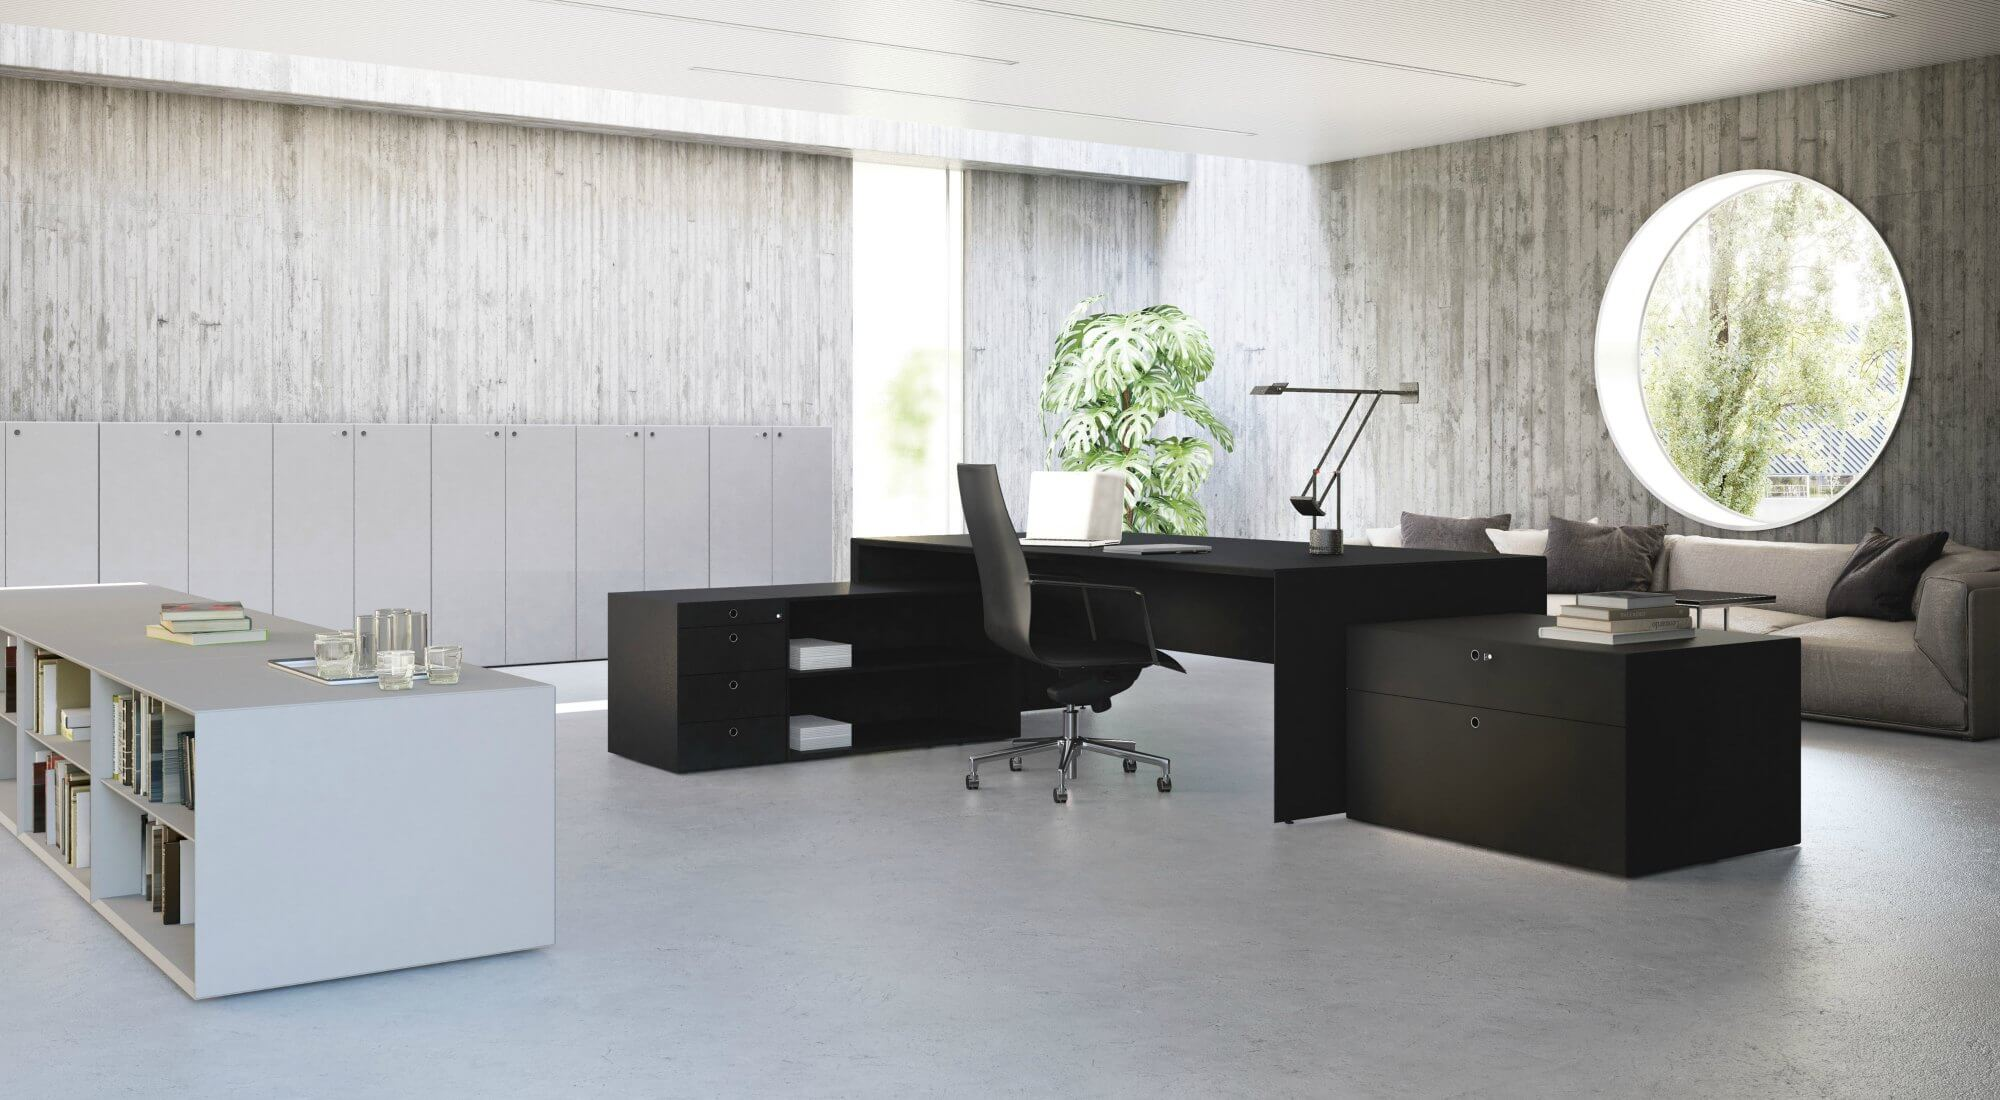 Muebles de oficina alta direccion quaranta5 fantoni for 5 muebles de oficina